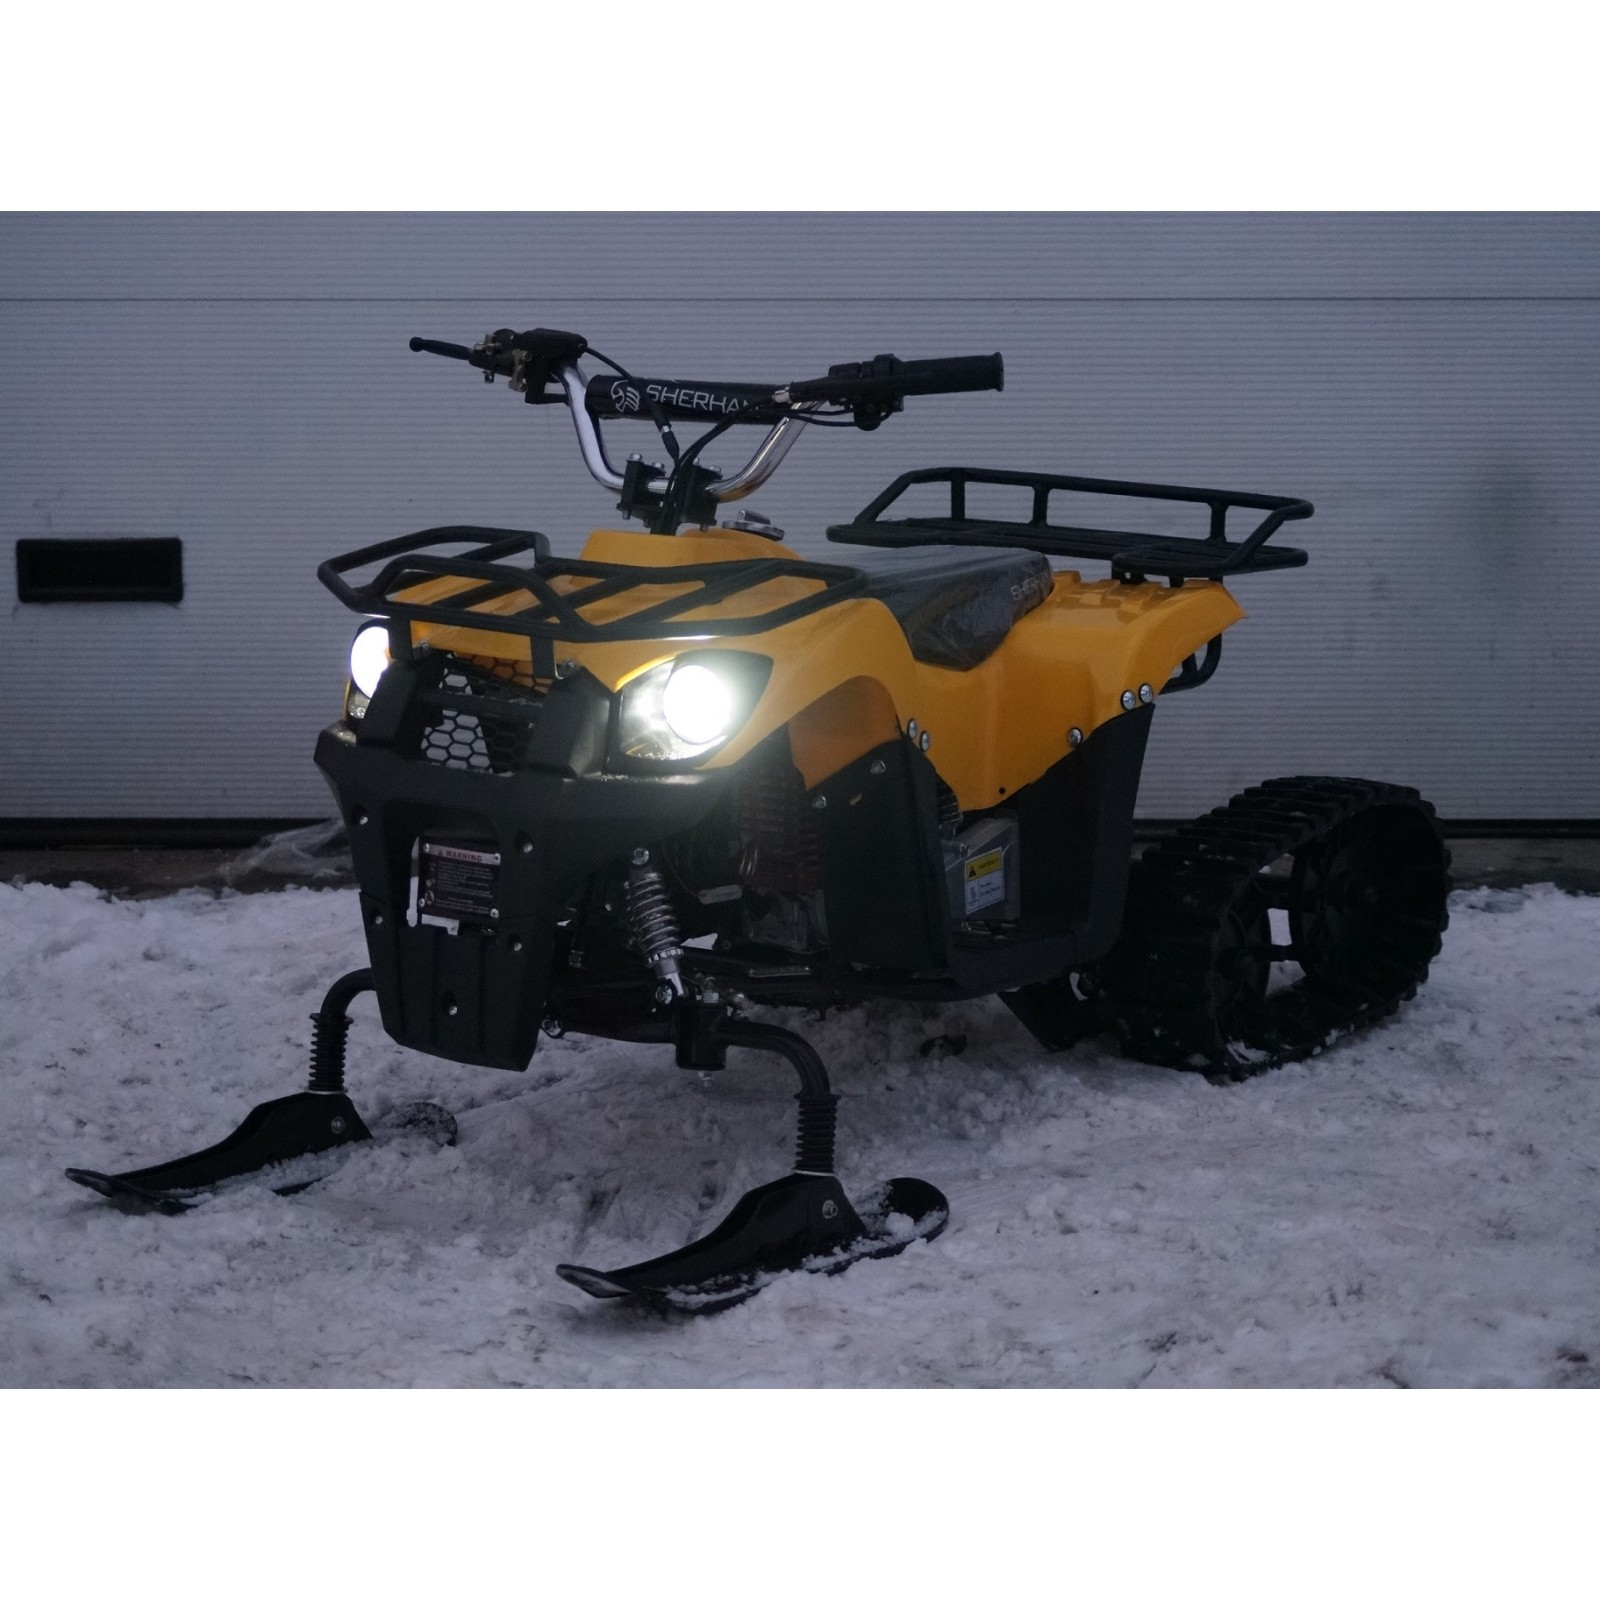 Снегоход-квадроцикл SHERHAN 300G LITE SNOW (50cc)